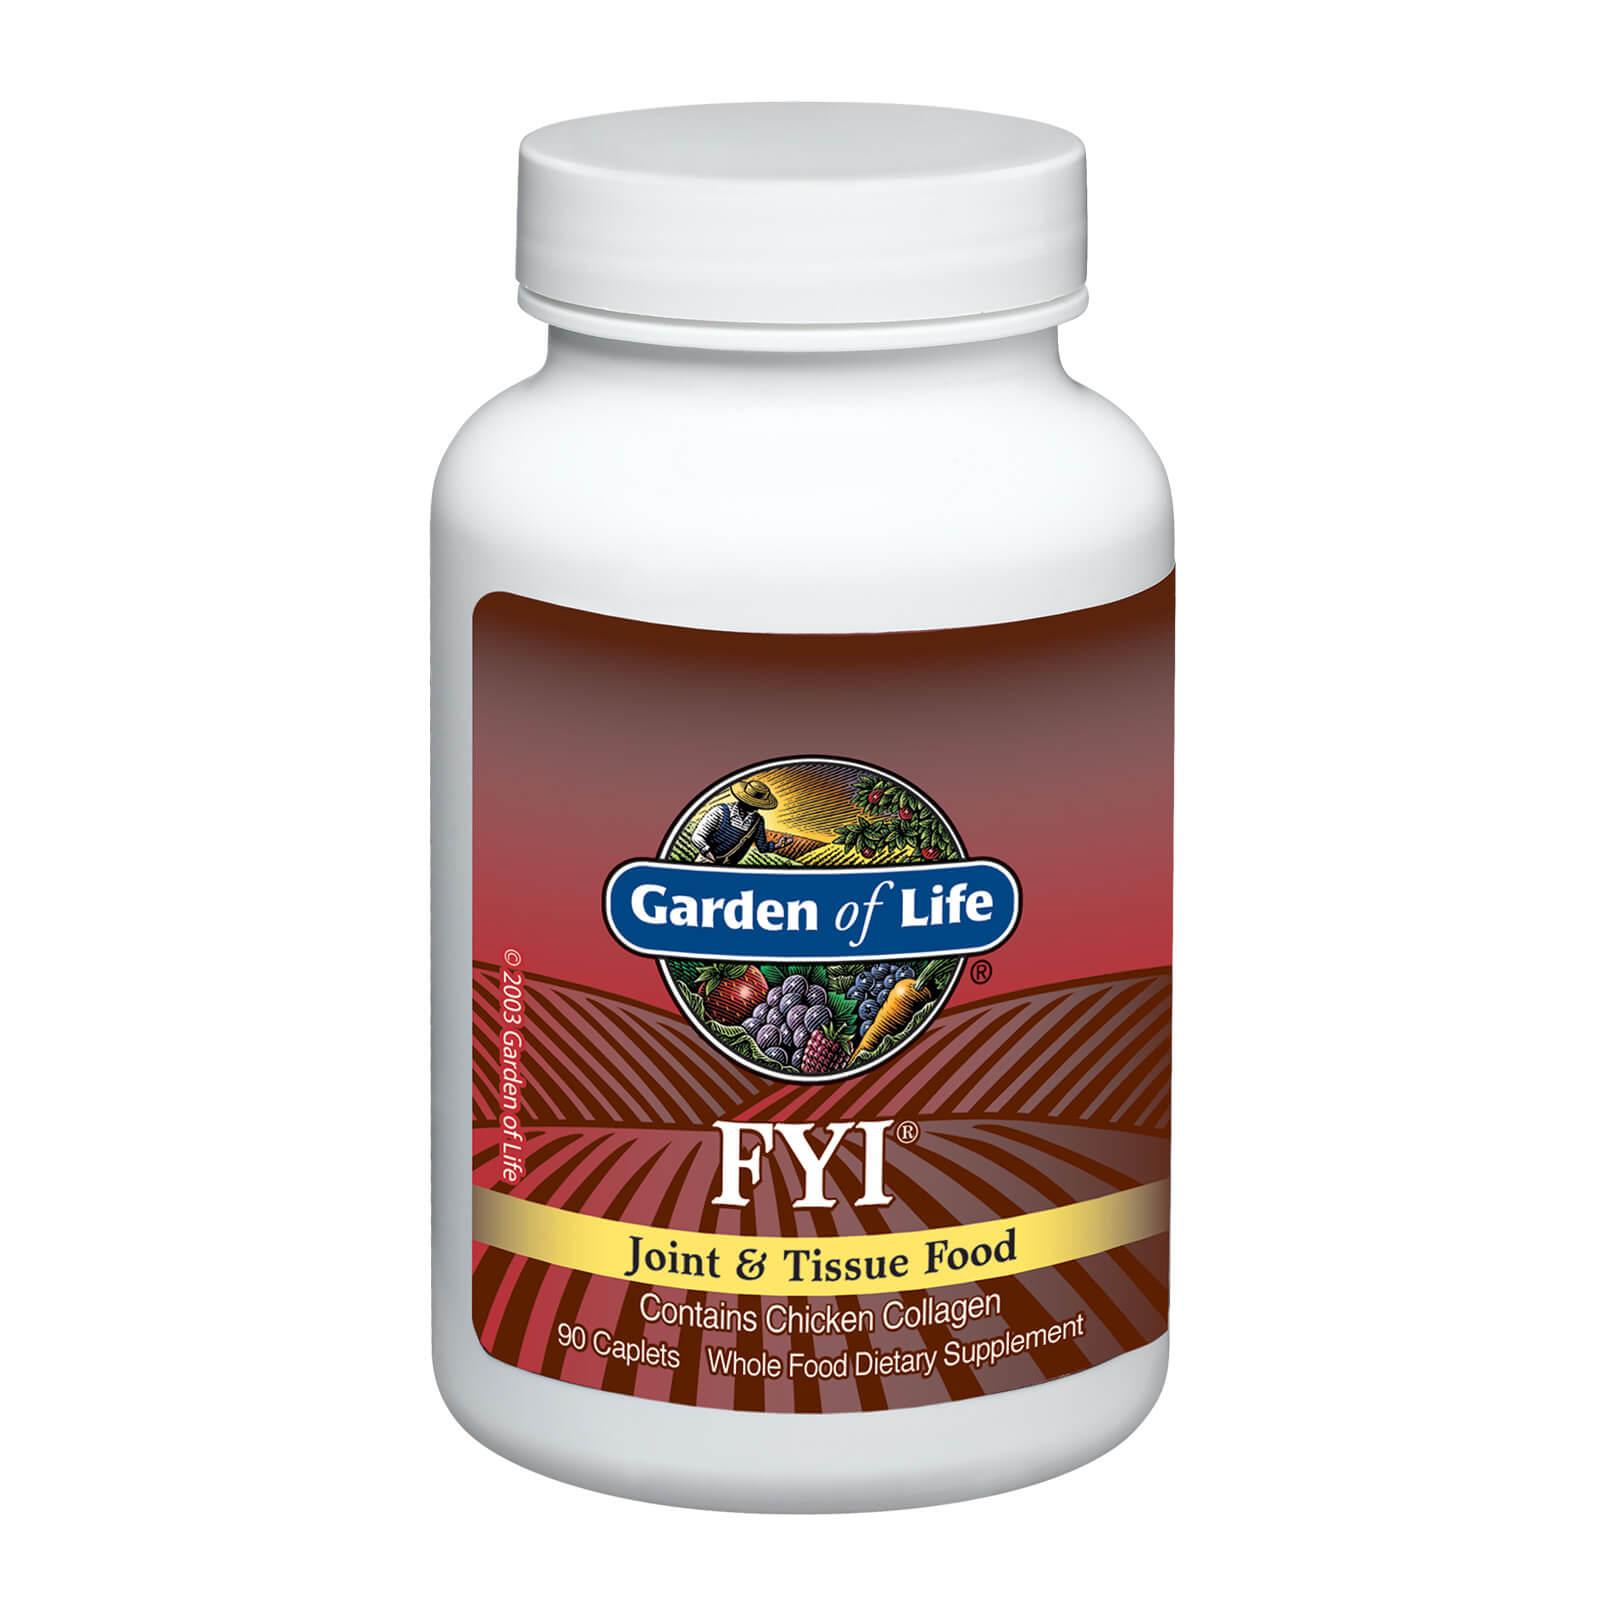 FYI Joint & Tissue Food 90 Caplets